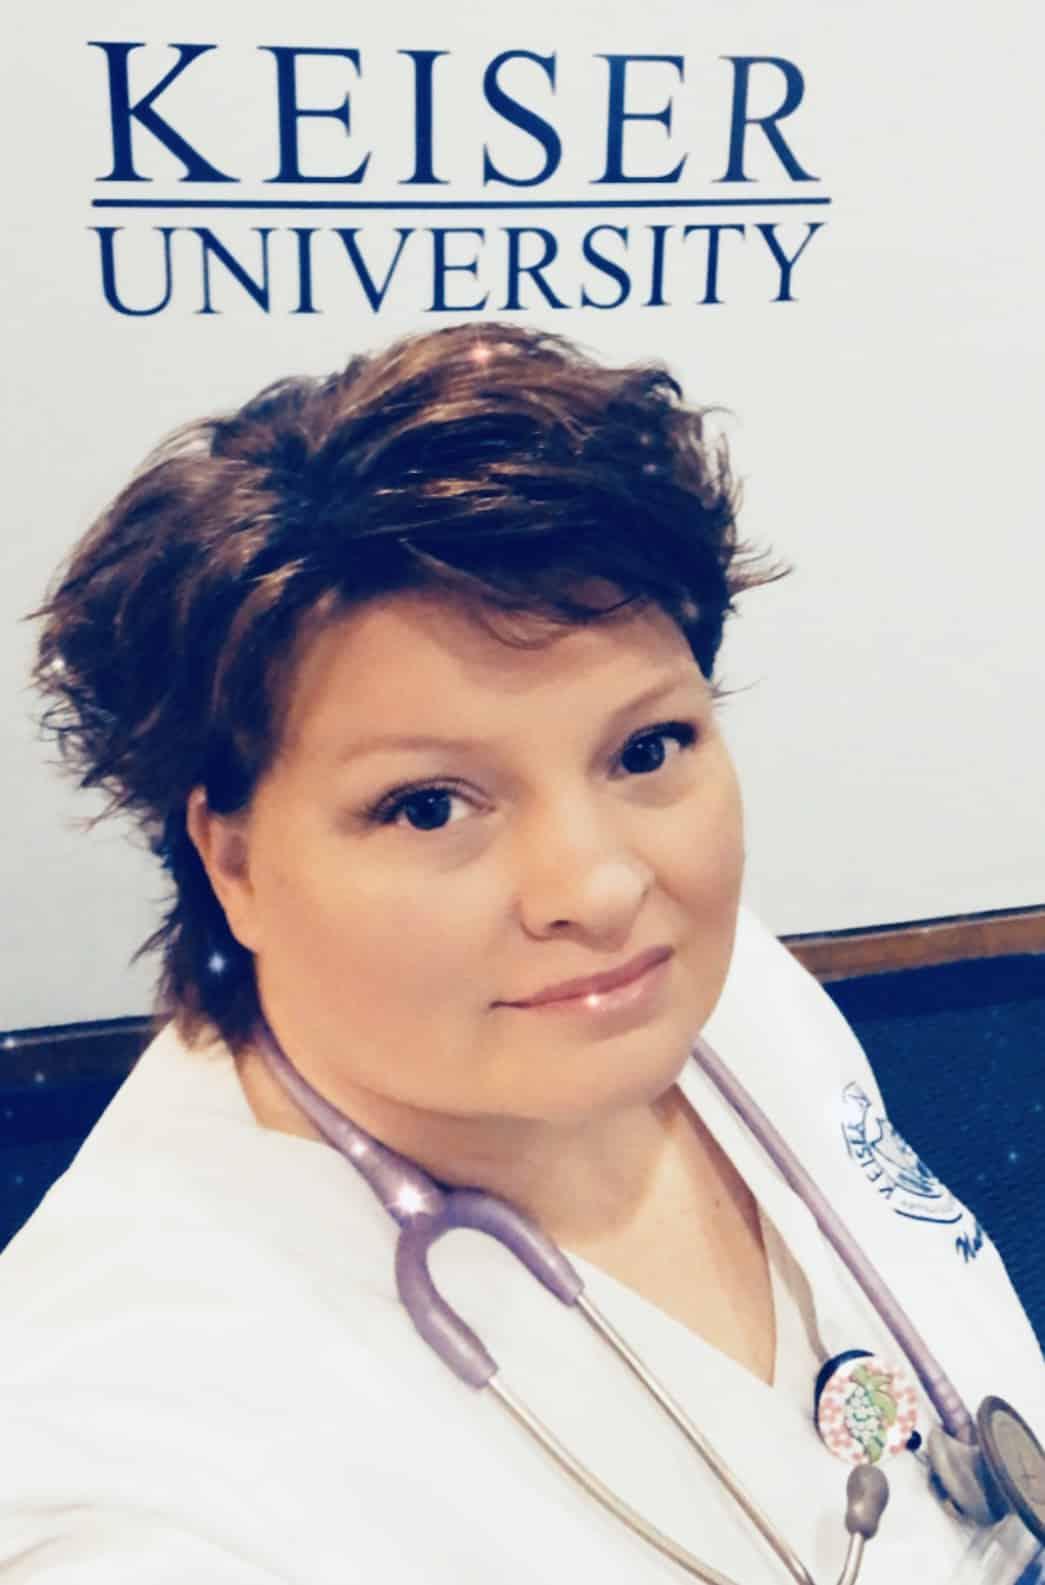 Keiser University Nursing Students is Awarded Endowed Scholarship